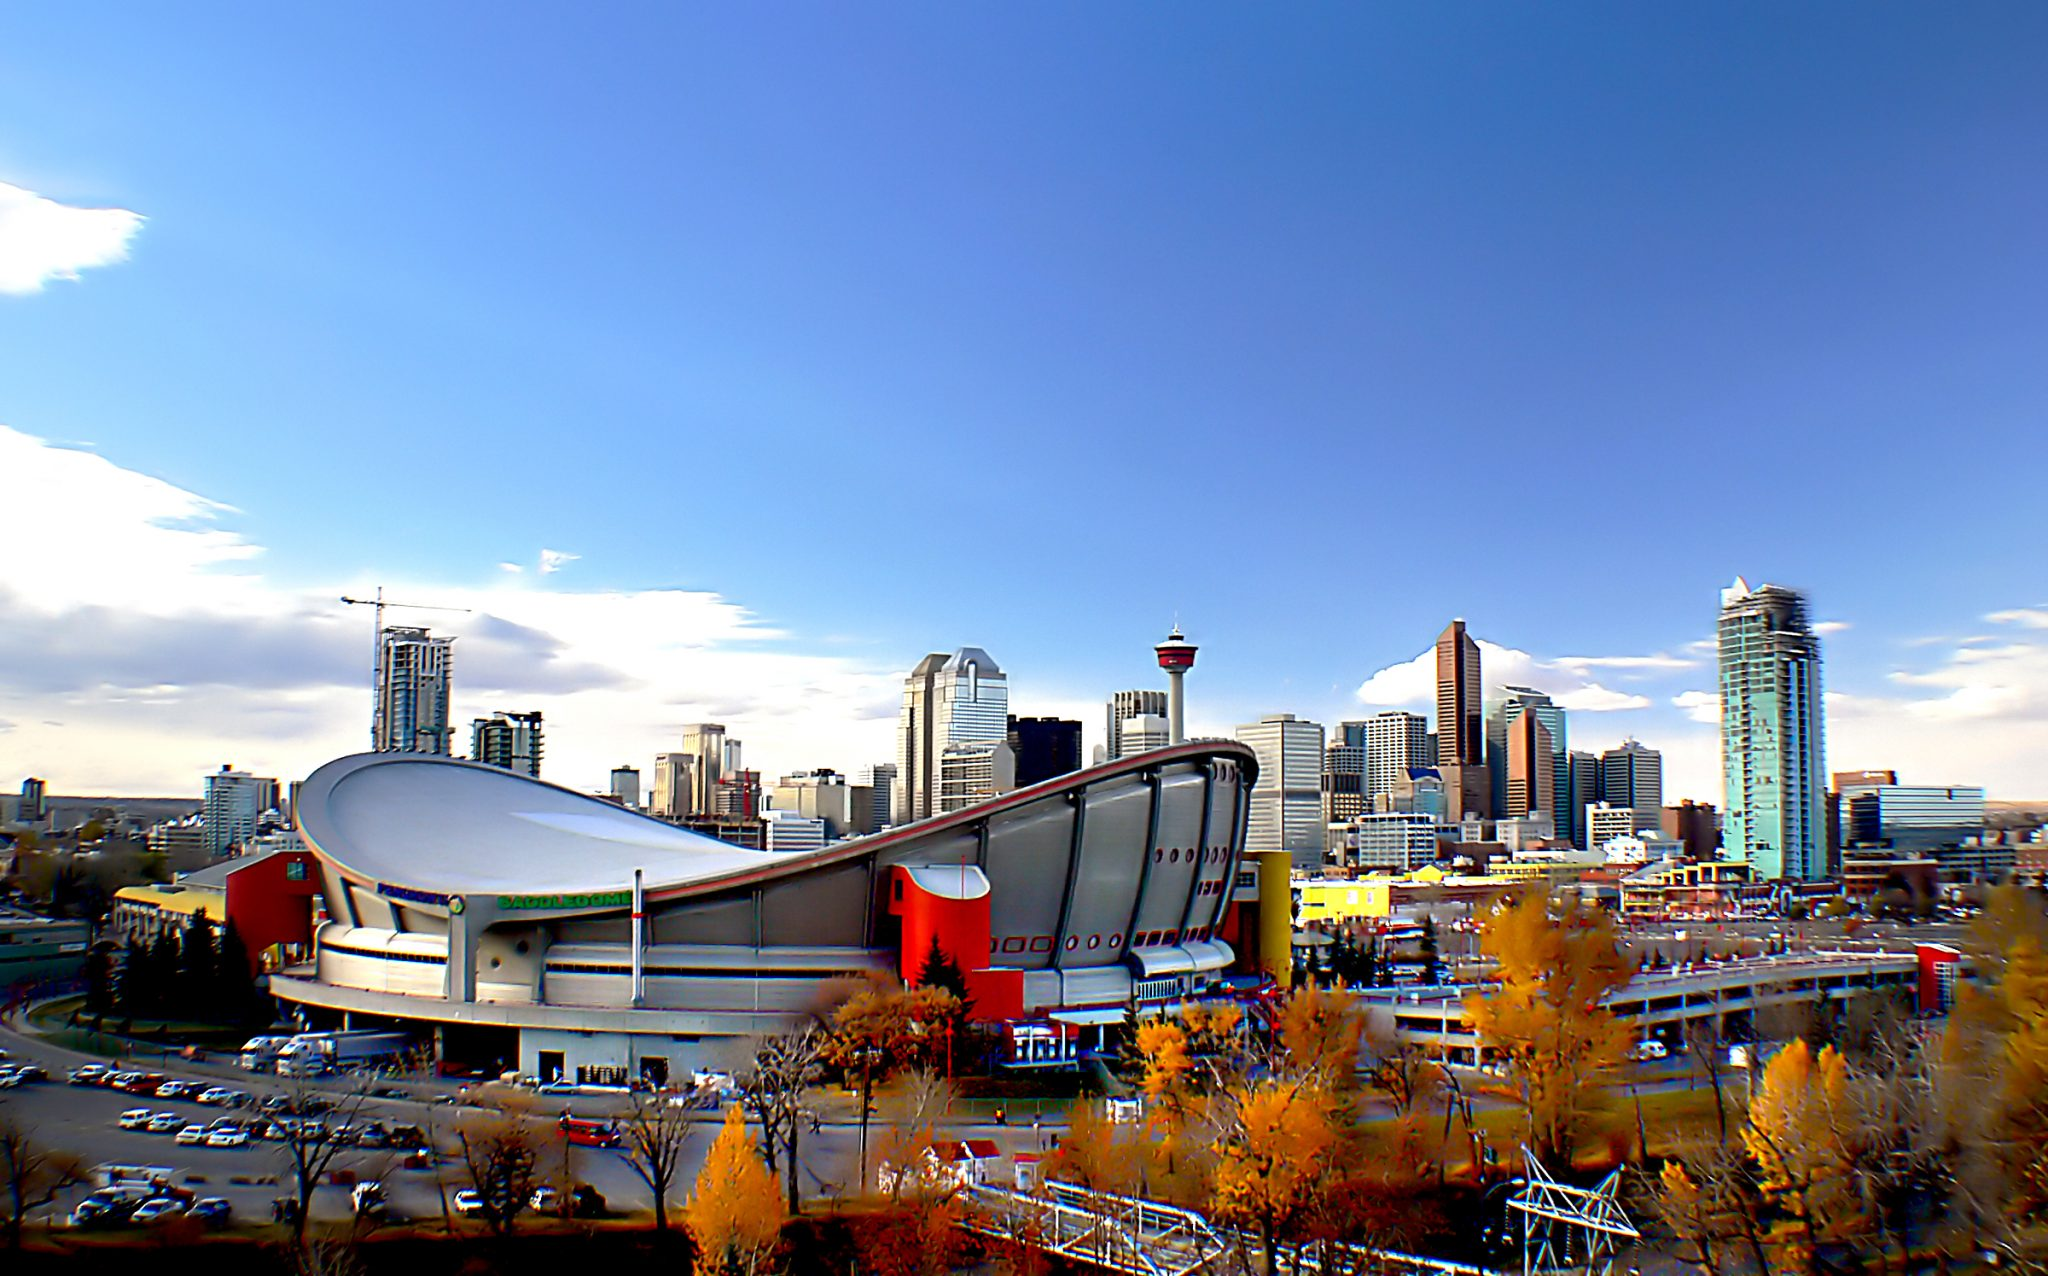 Stadium, buildings, and towers in Calgary.